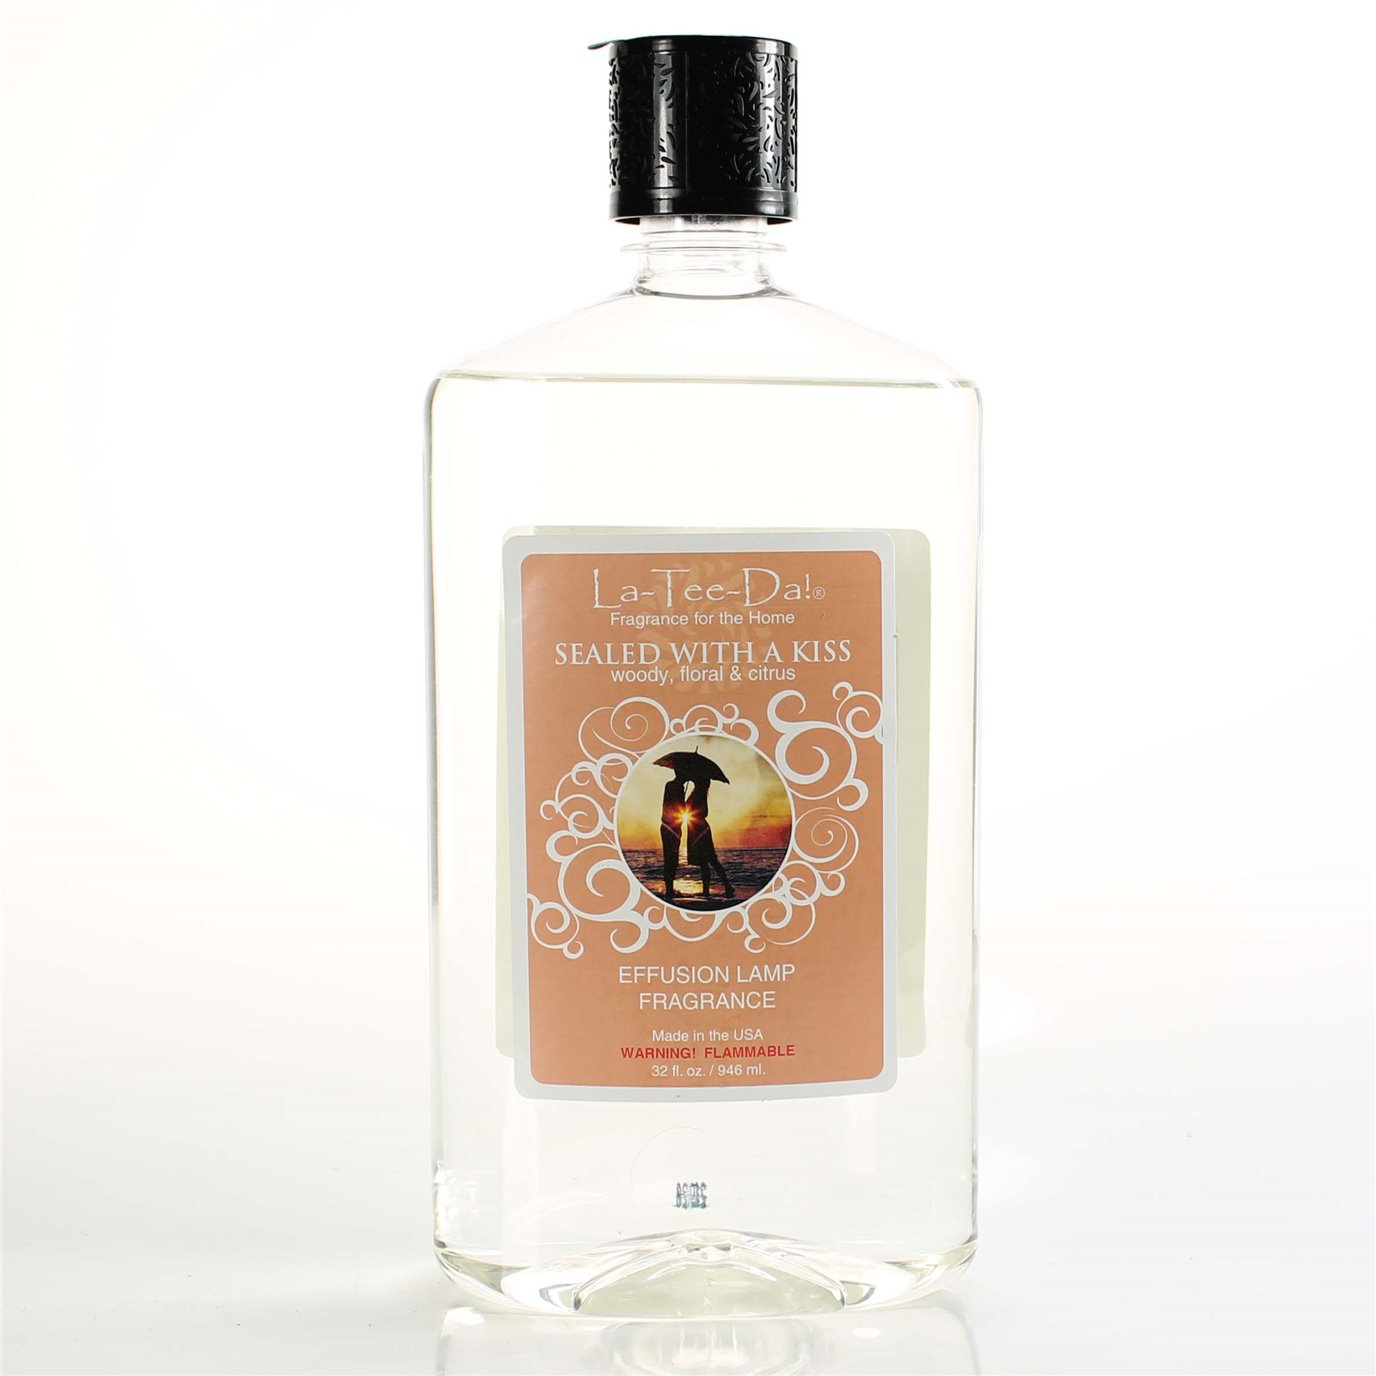 La Tee Da Fuel Fragrance Sealed With a Kiss (32 oz.)